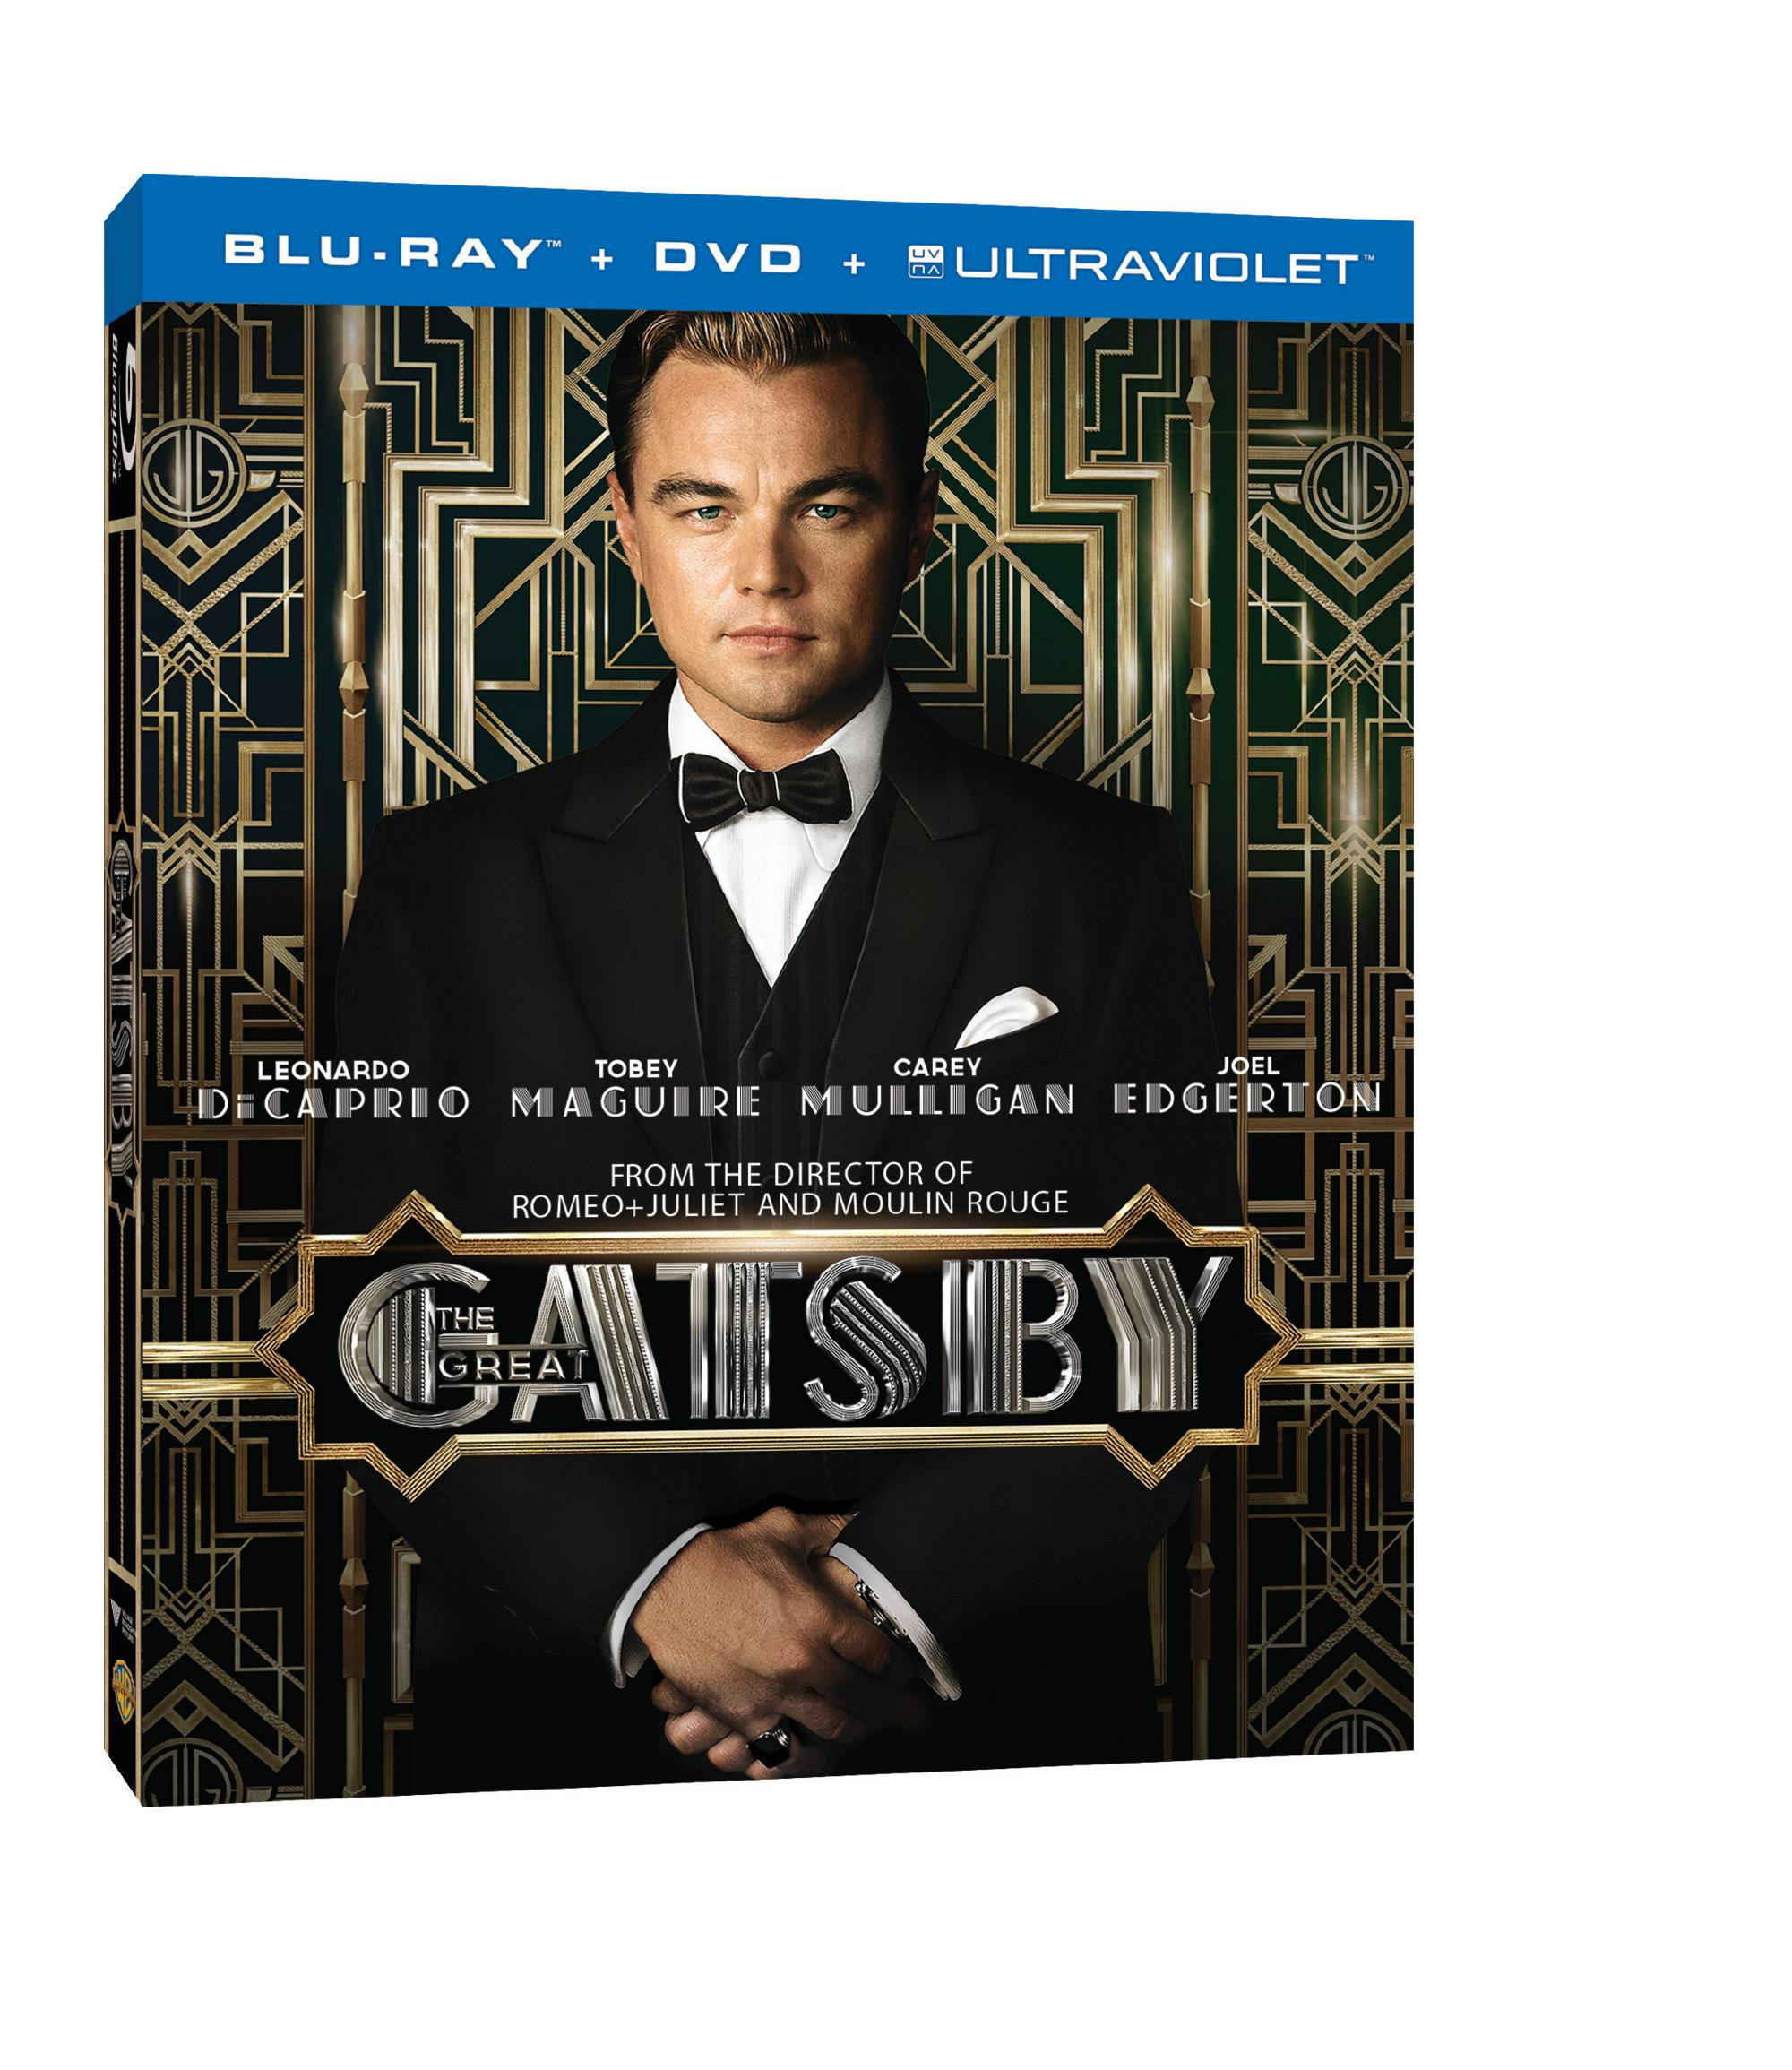 Great Gatsby box